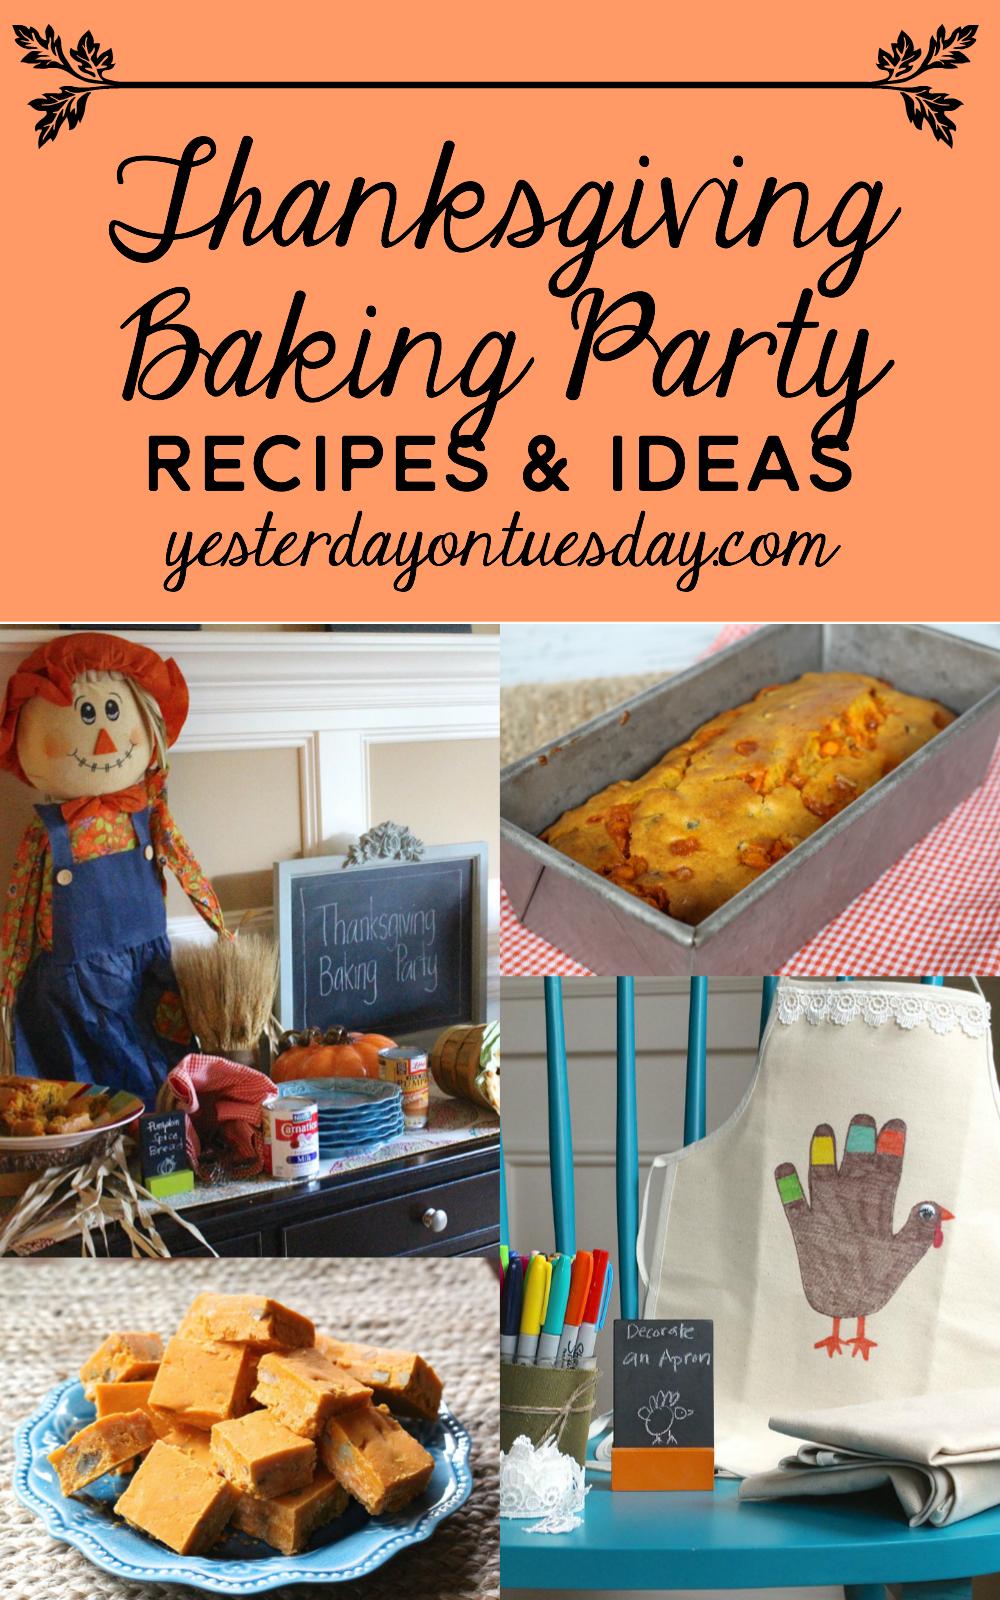 Thanksgiving Baking Party